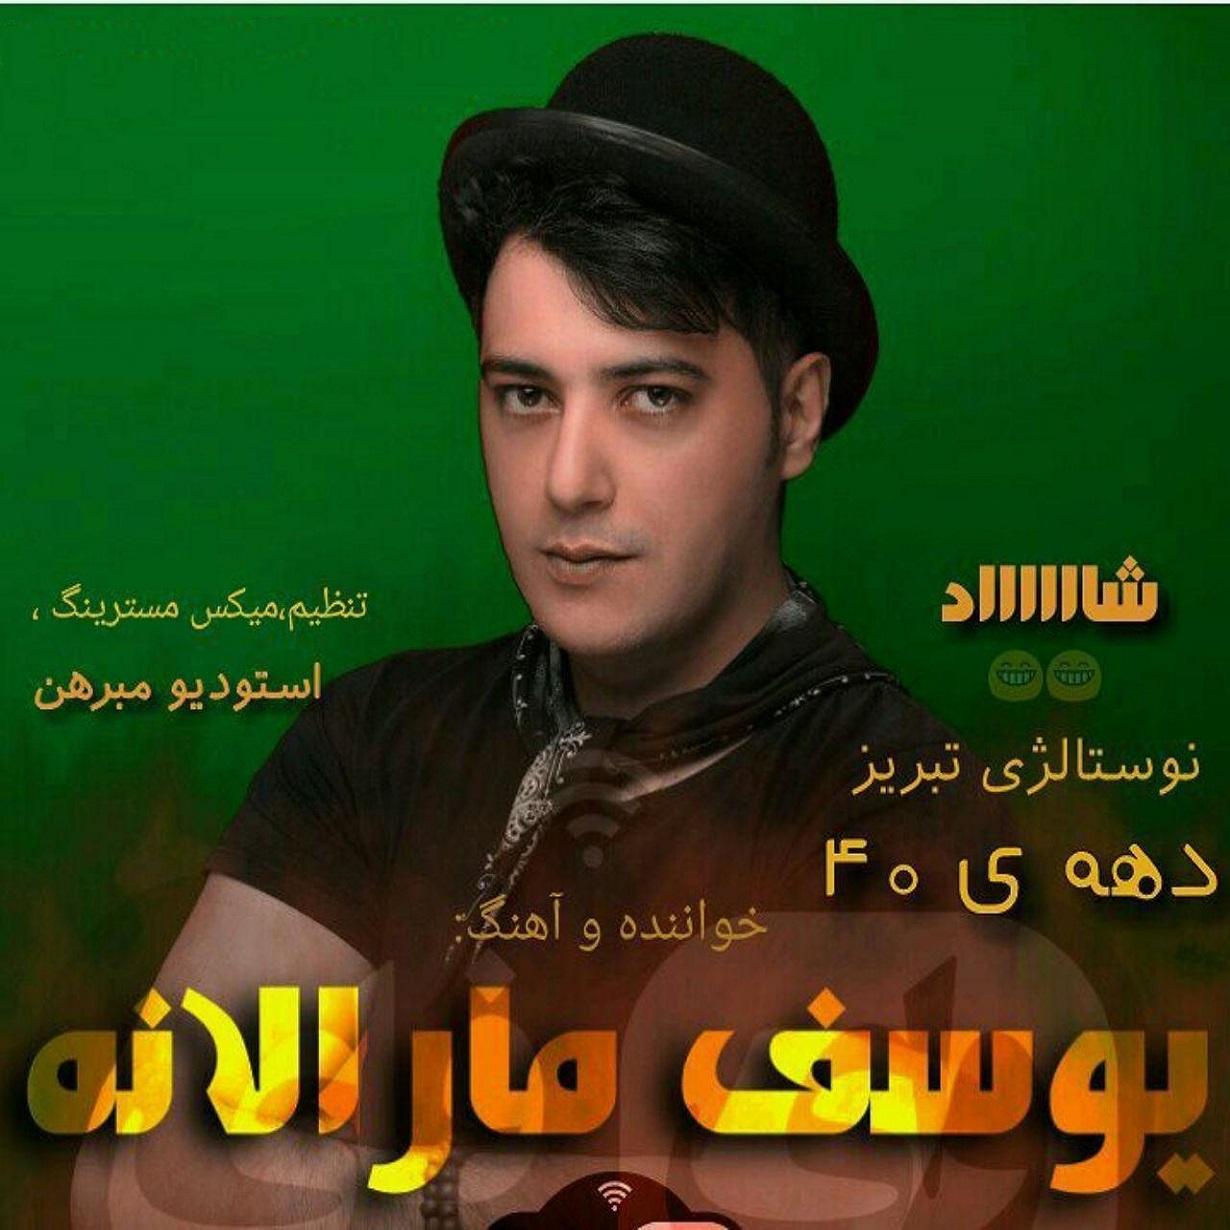 Yusef Maralan - Daheye 40